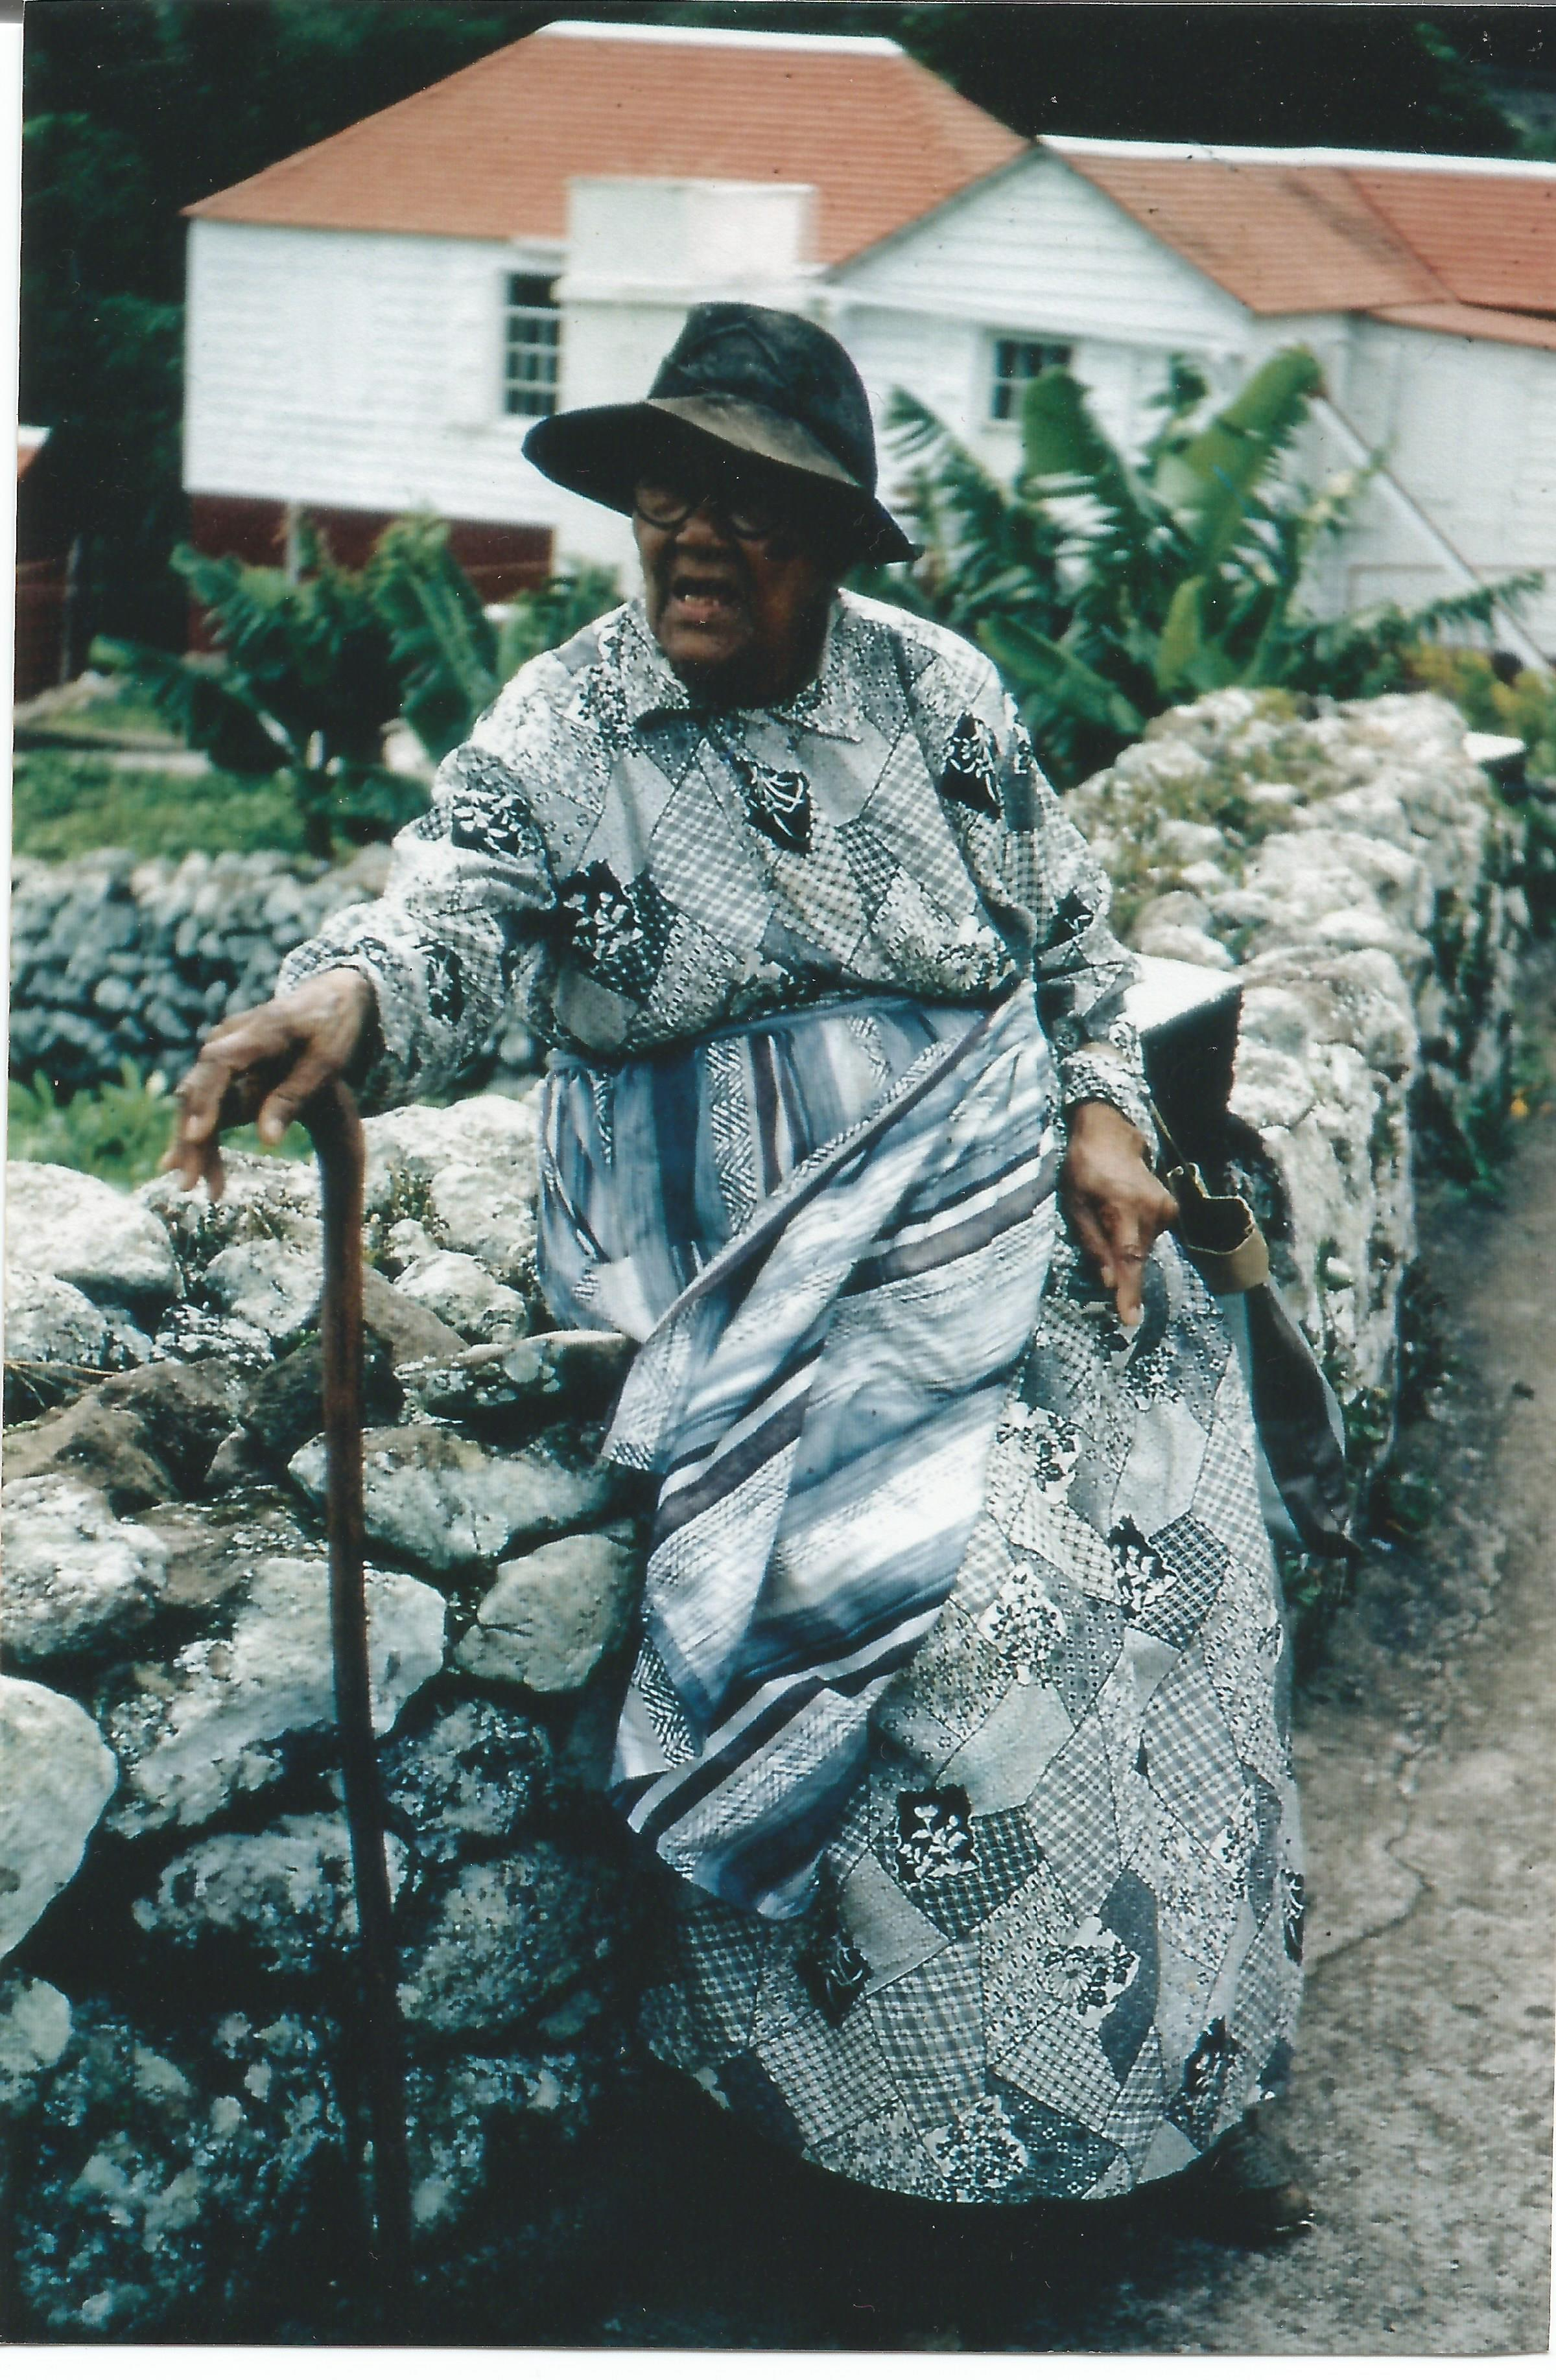 Uncategorized | The Saba Islander | Page 18